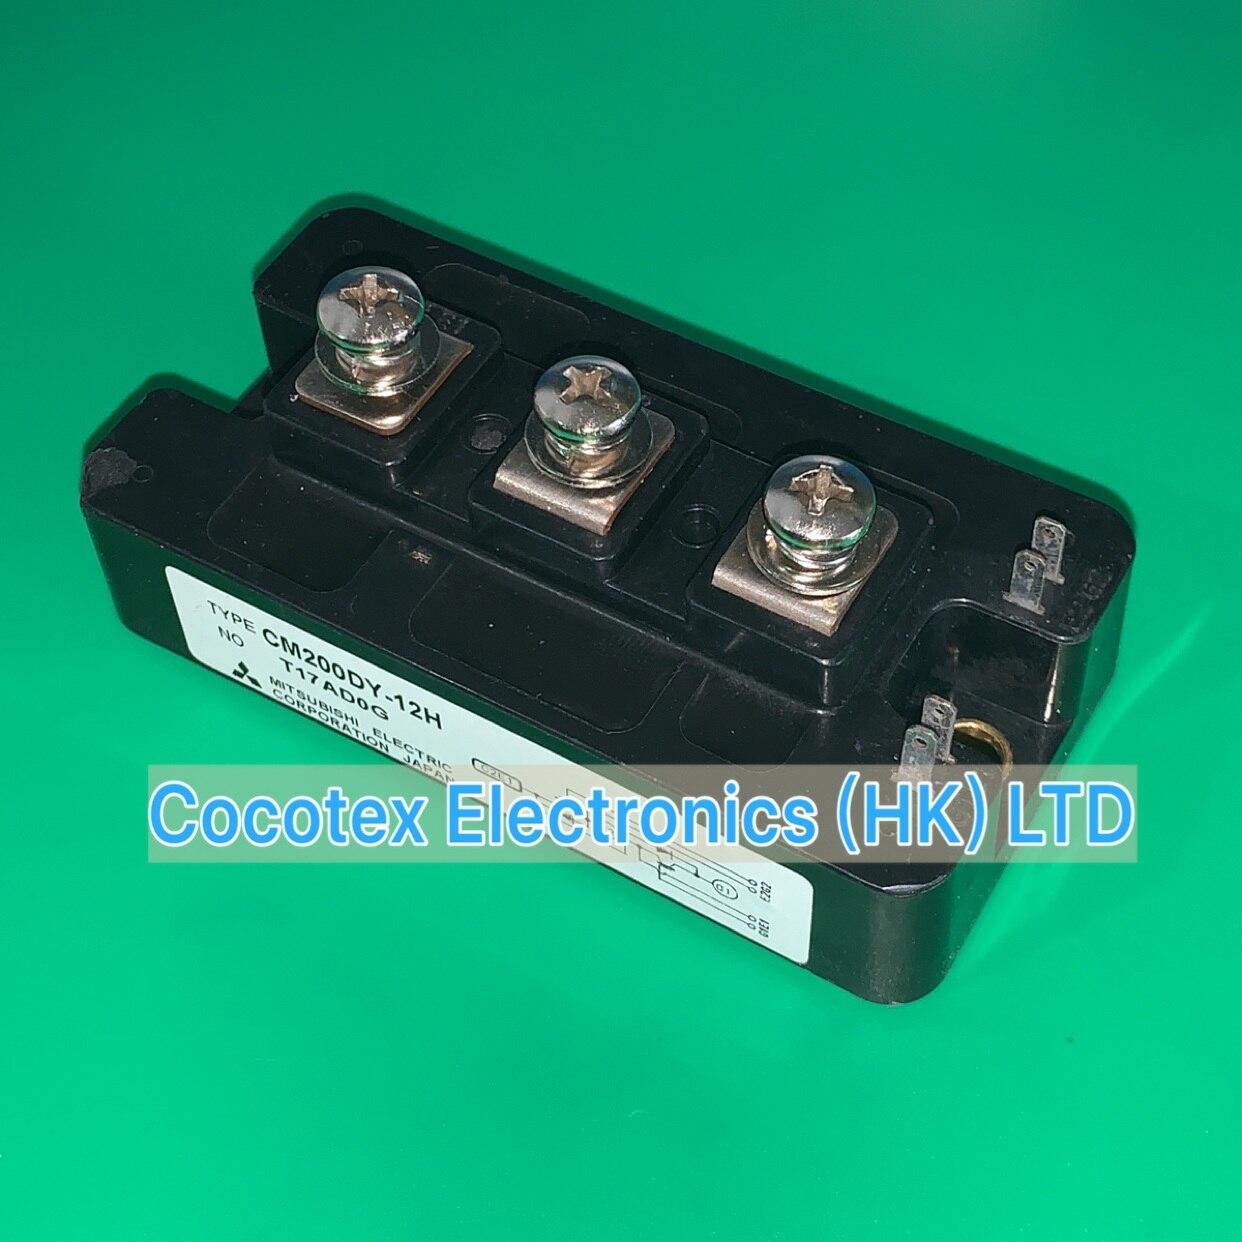 Где купить Модуль CM200DY-12H см 200DY-12H IGBT MOD DUAL 600V 200A H SER CM200DY12H